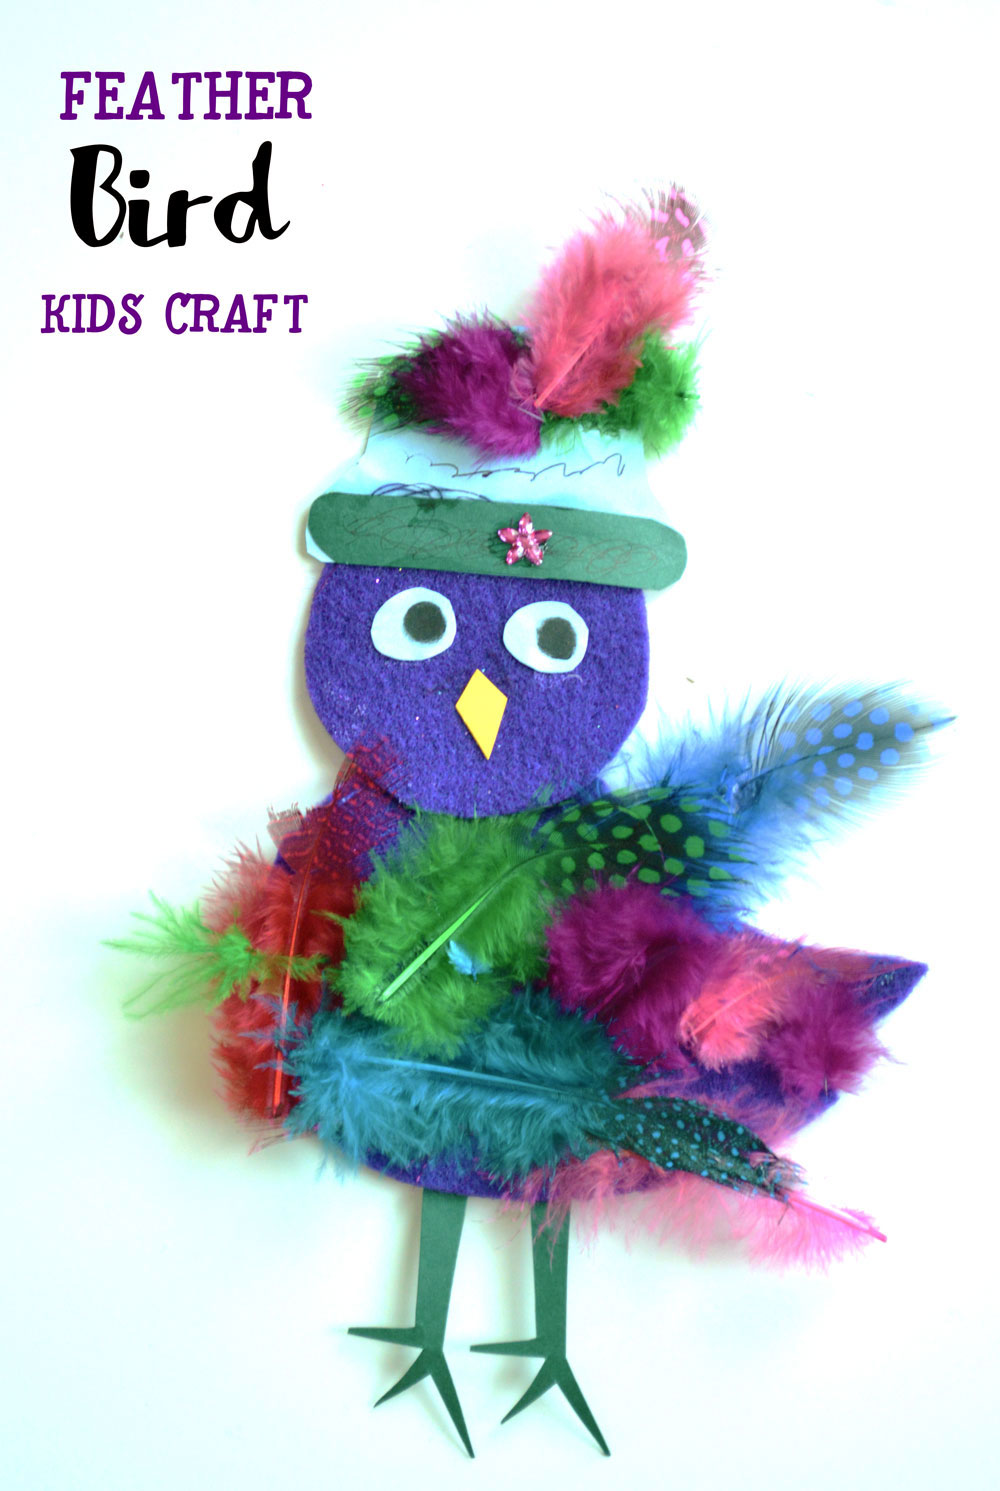 Feather Bird Kids Craft Idea for Preschool